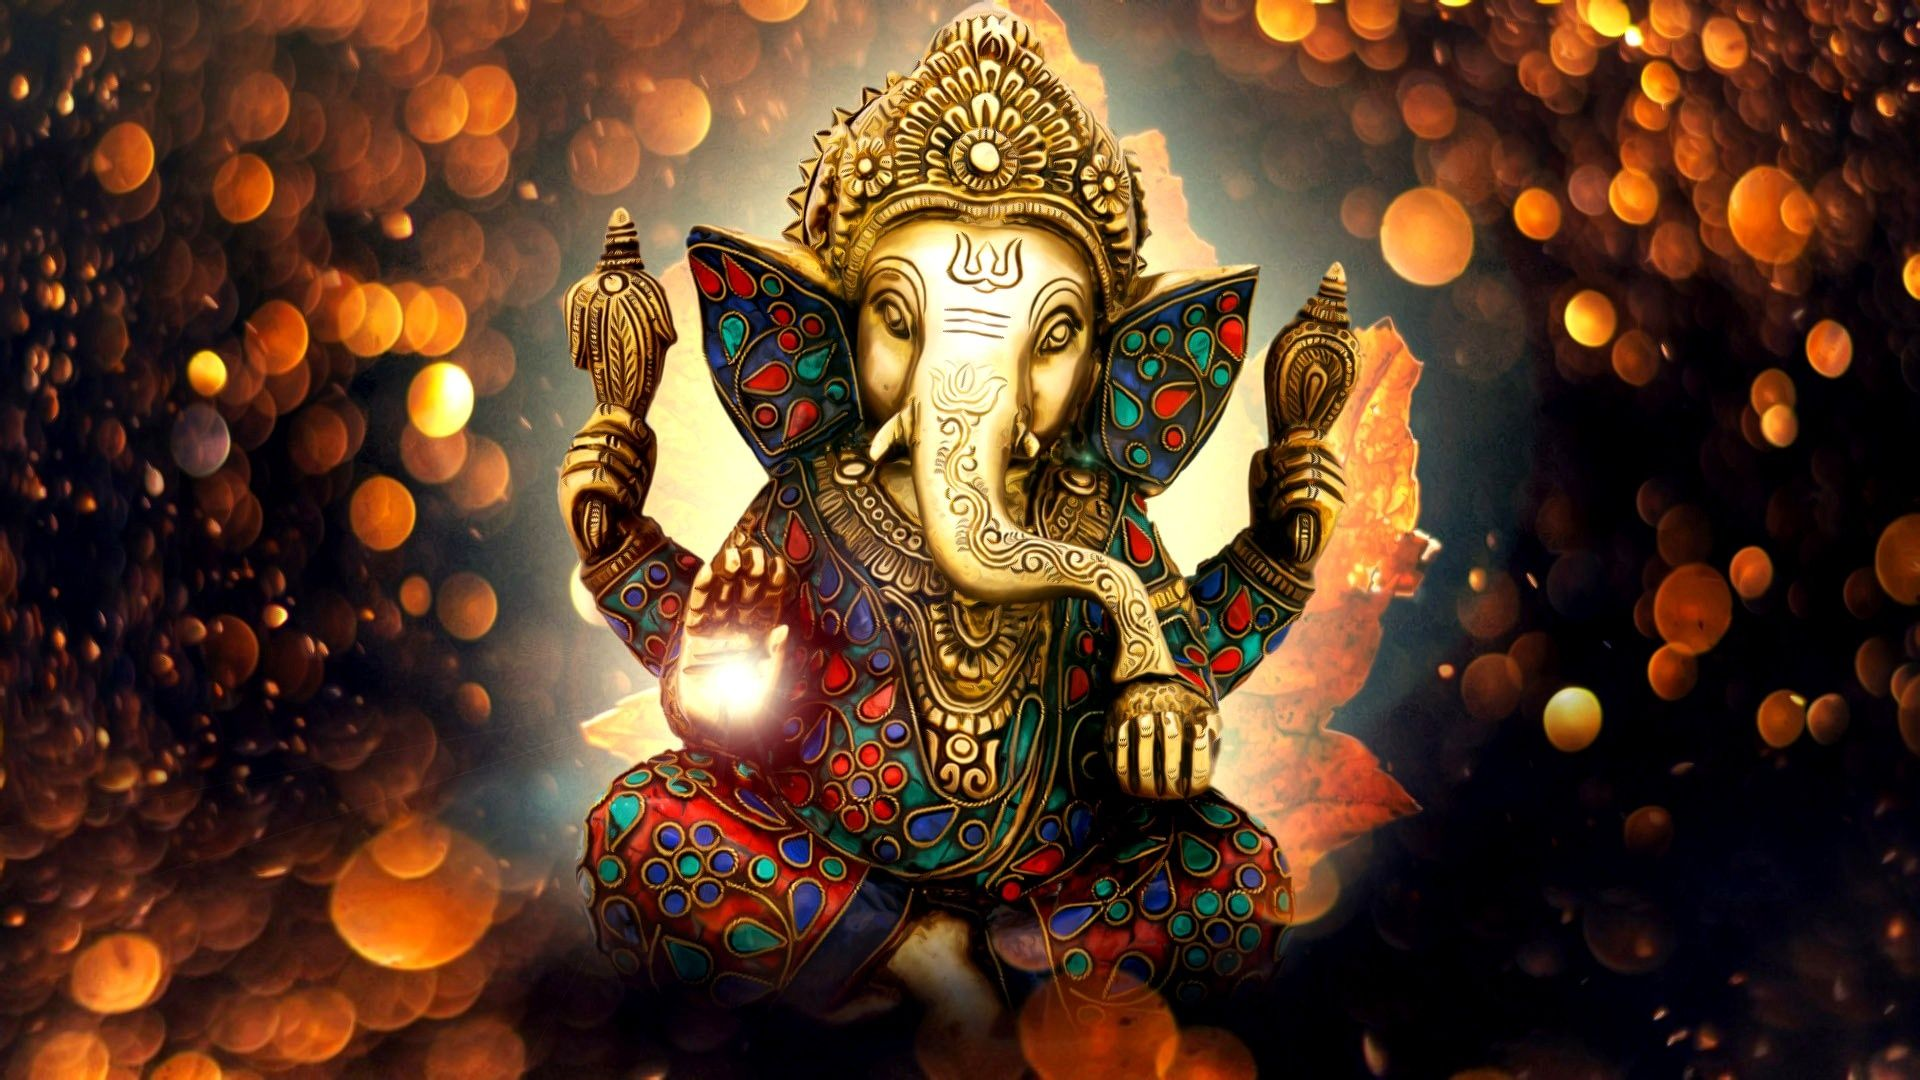 Ganesha Wallpapers   Top Ganesha Backgrounds   WallpaperAccess 1920x1080